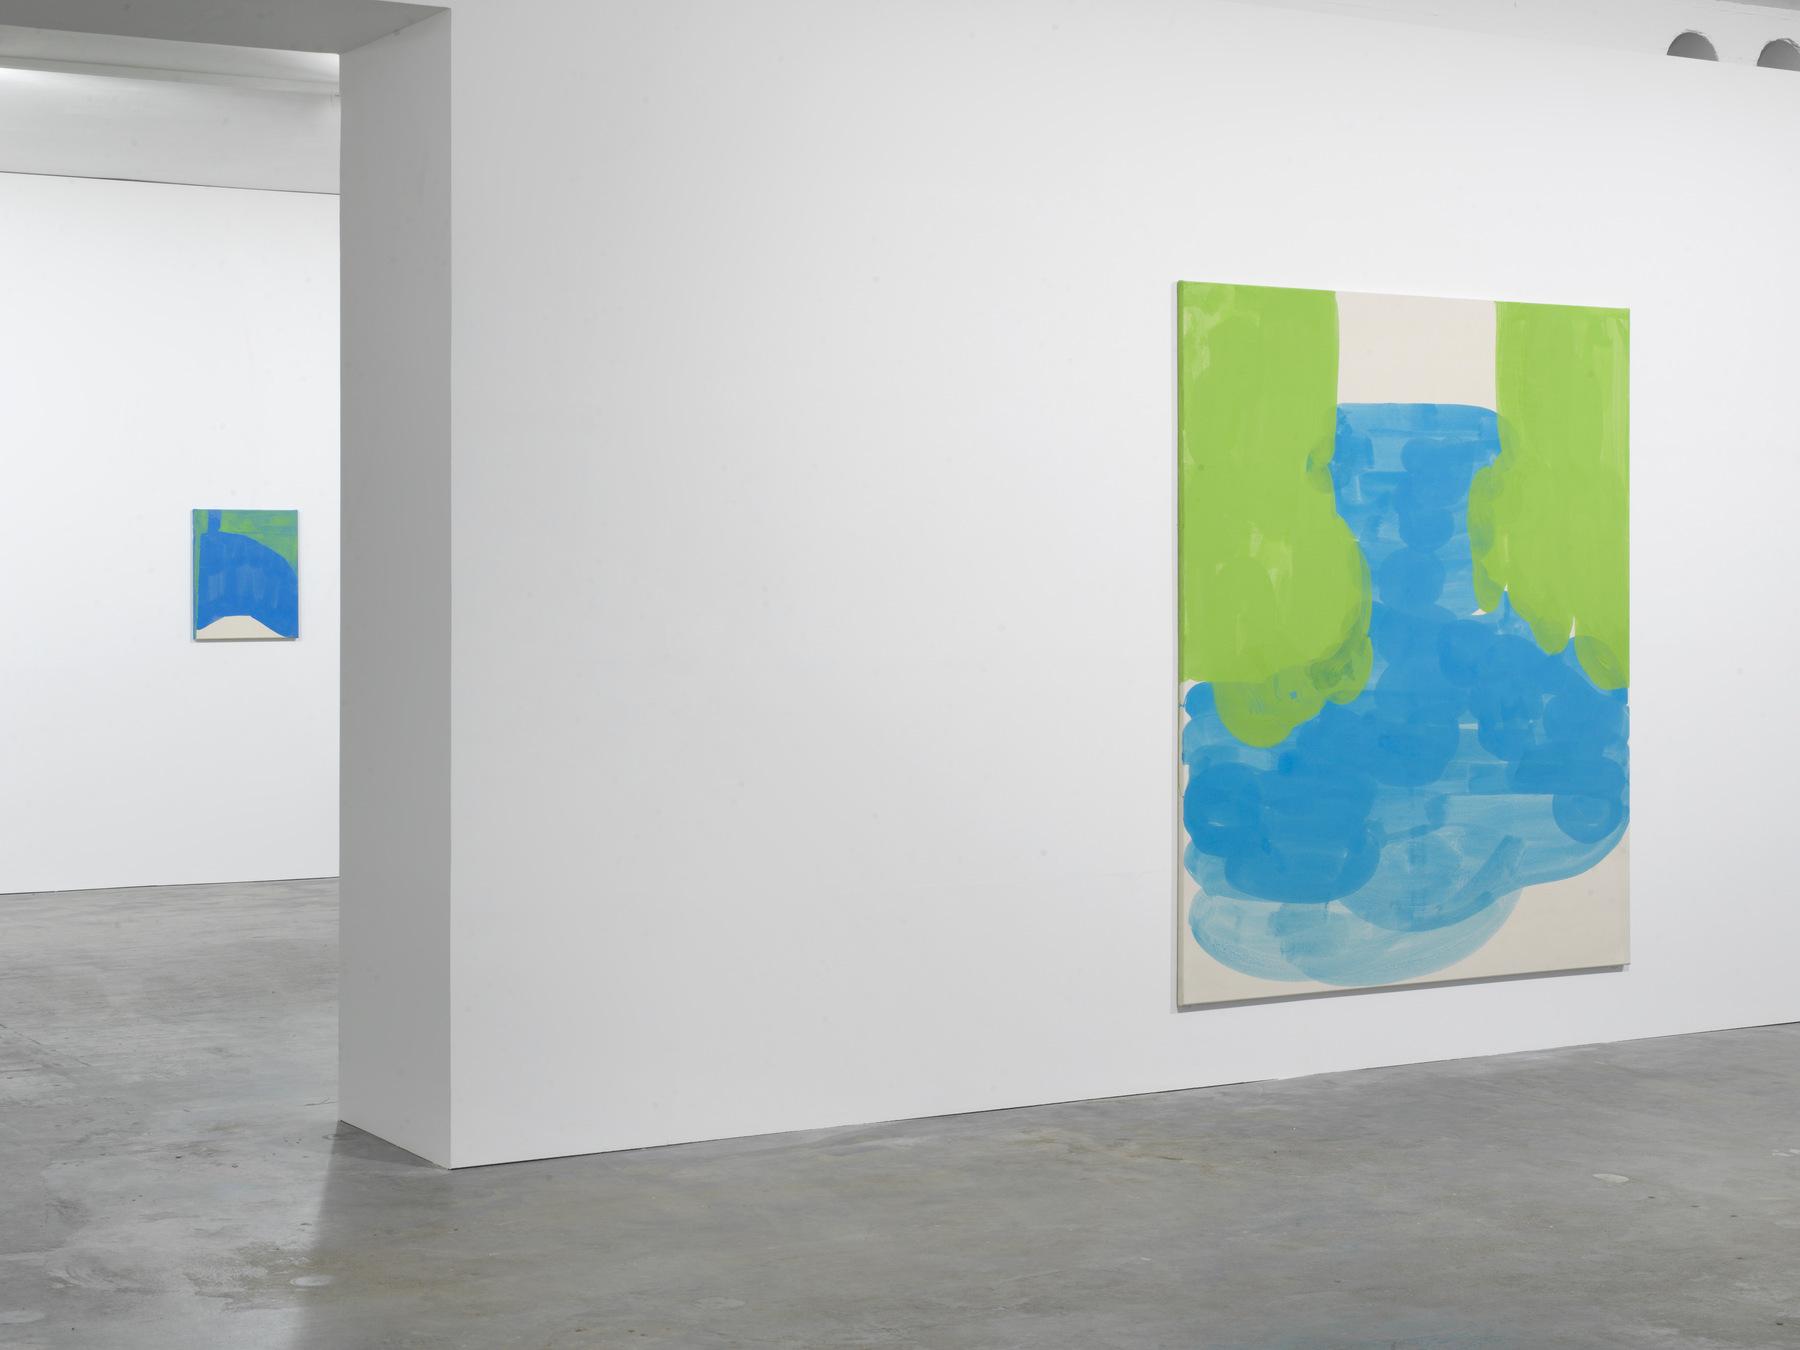 Tamina Amadyar_10,000 hours_Galerie Guido W. Baudach, Berlin_06